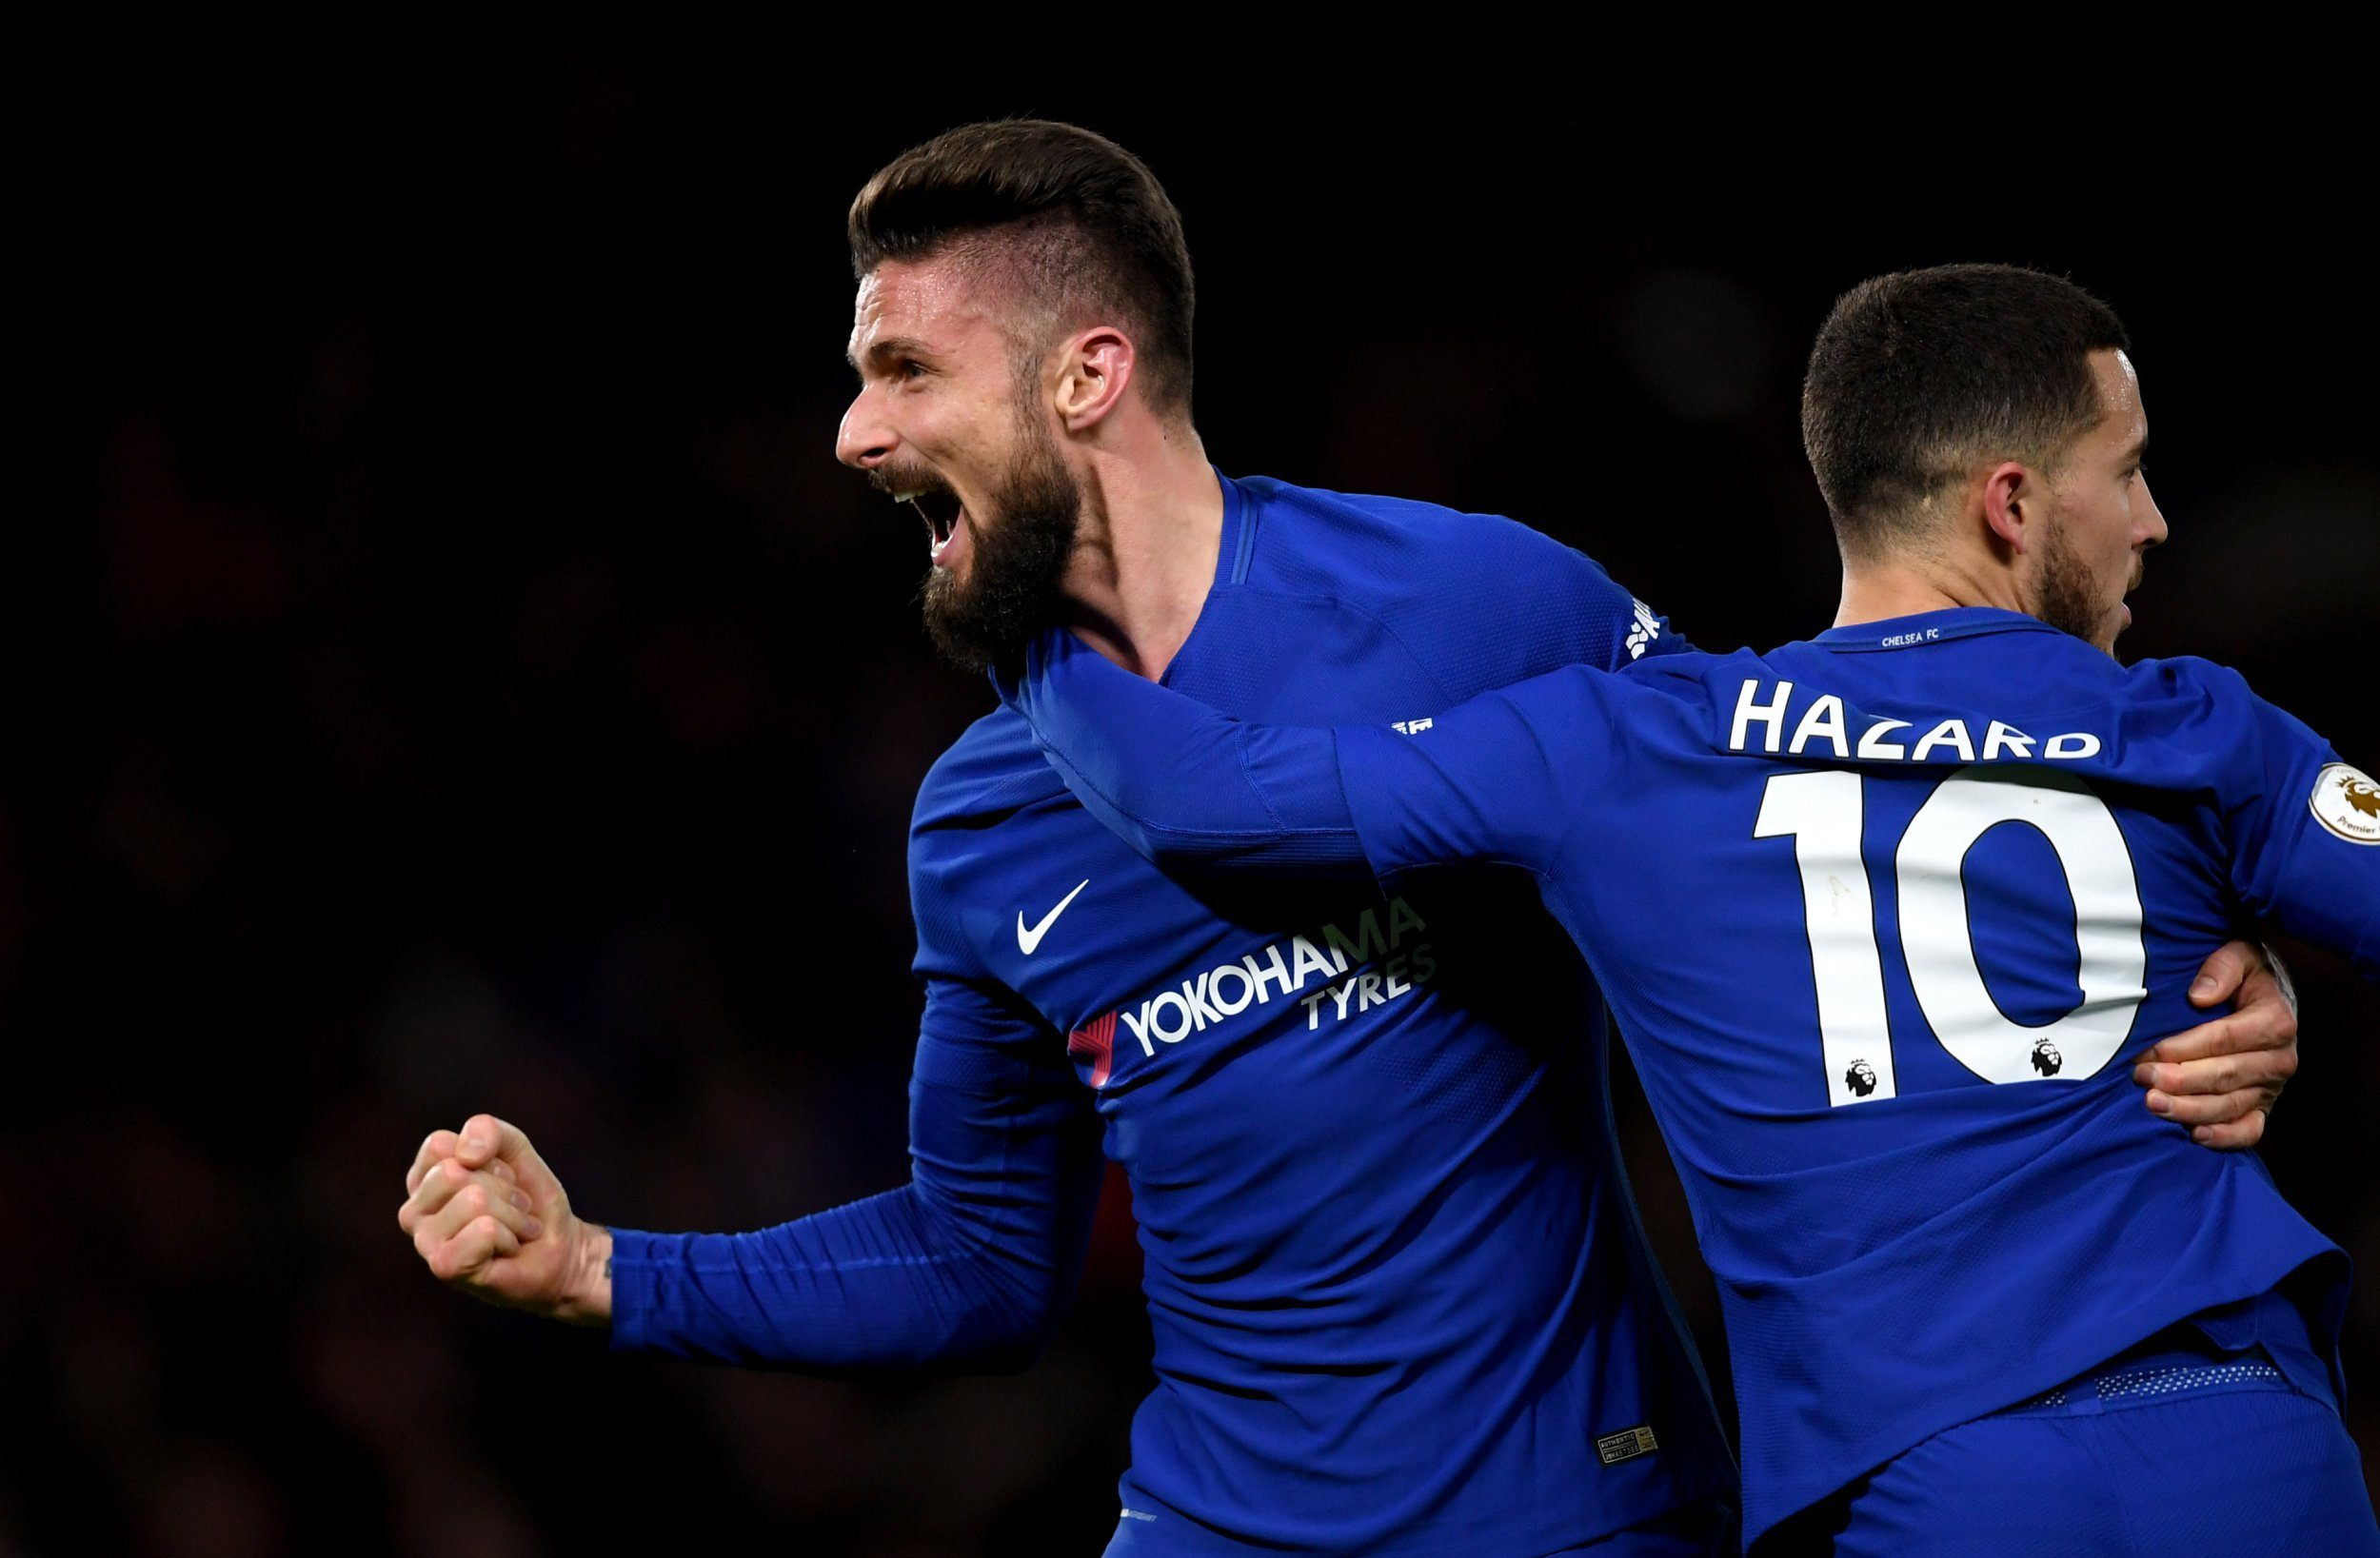 Eden Hazard heaps praise on Olivier Giroud after Chelsea beat West Brom